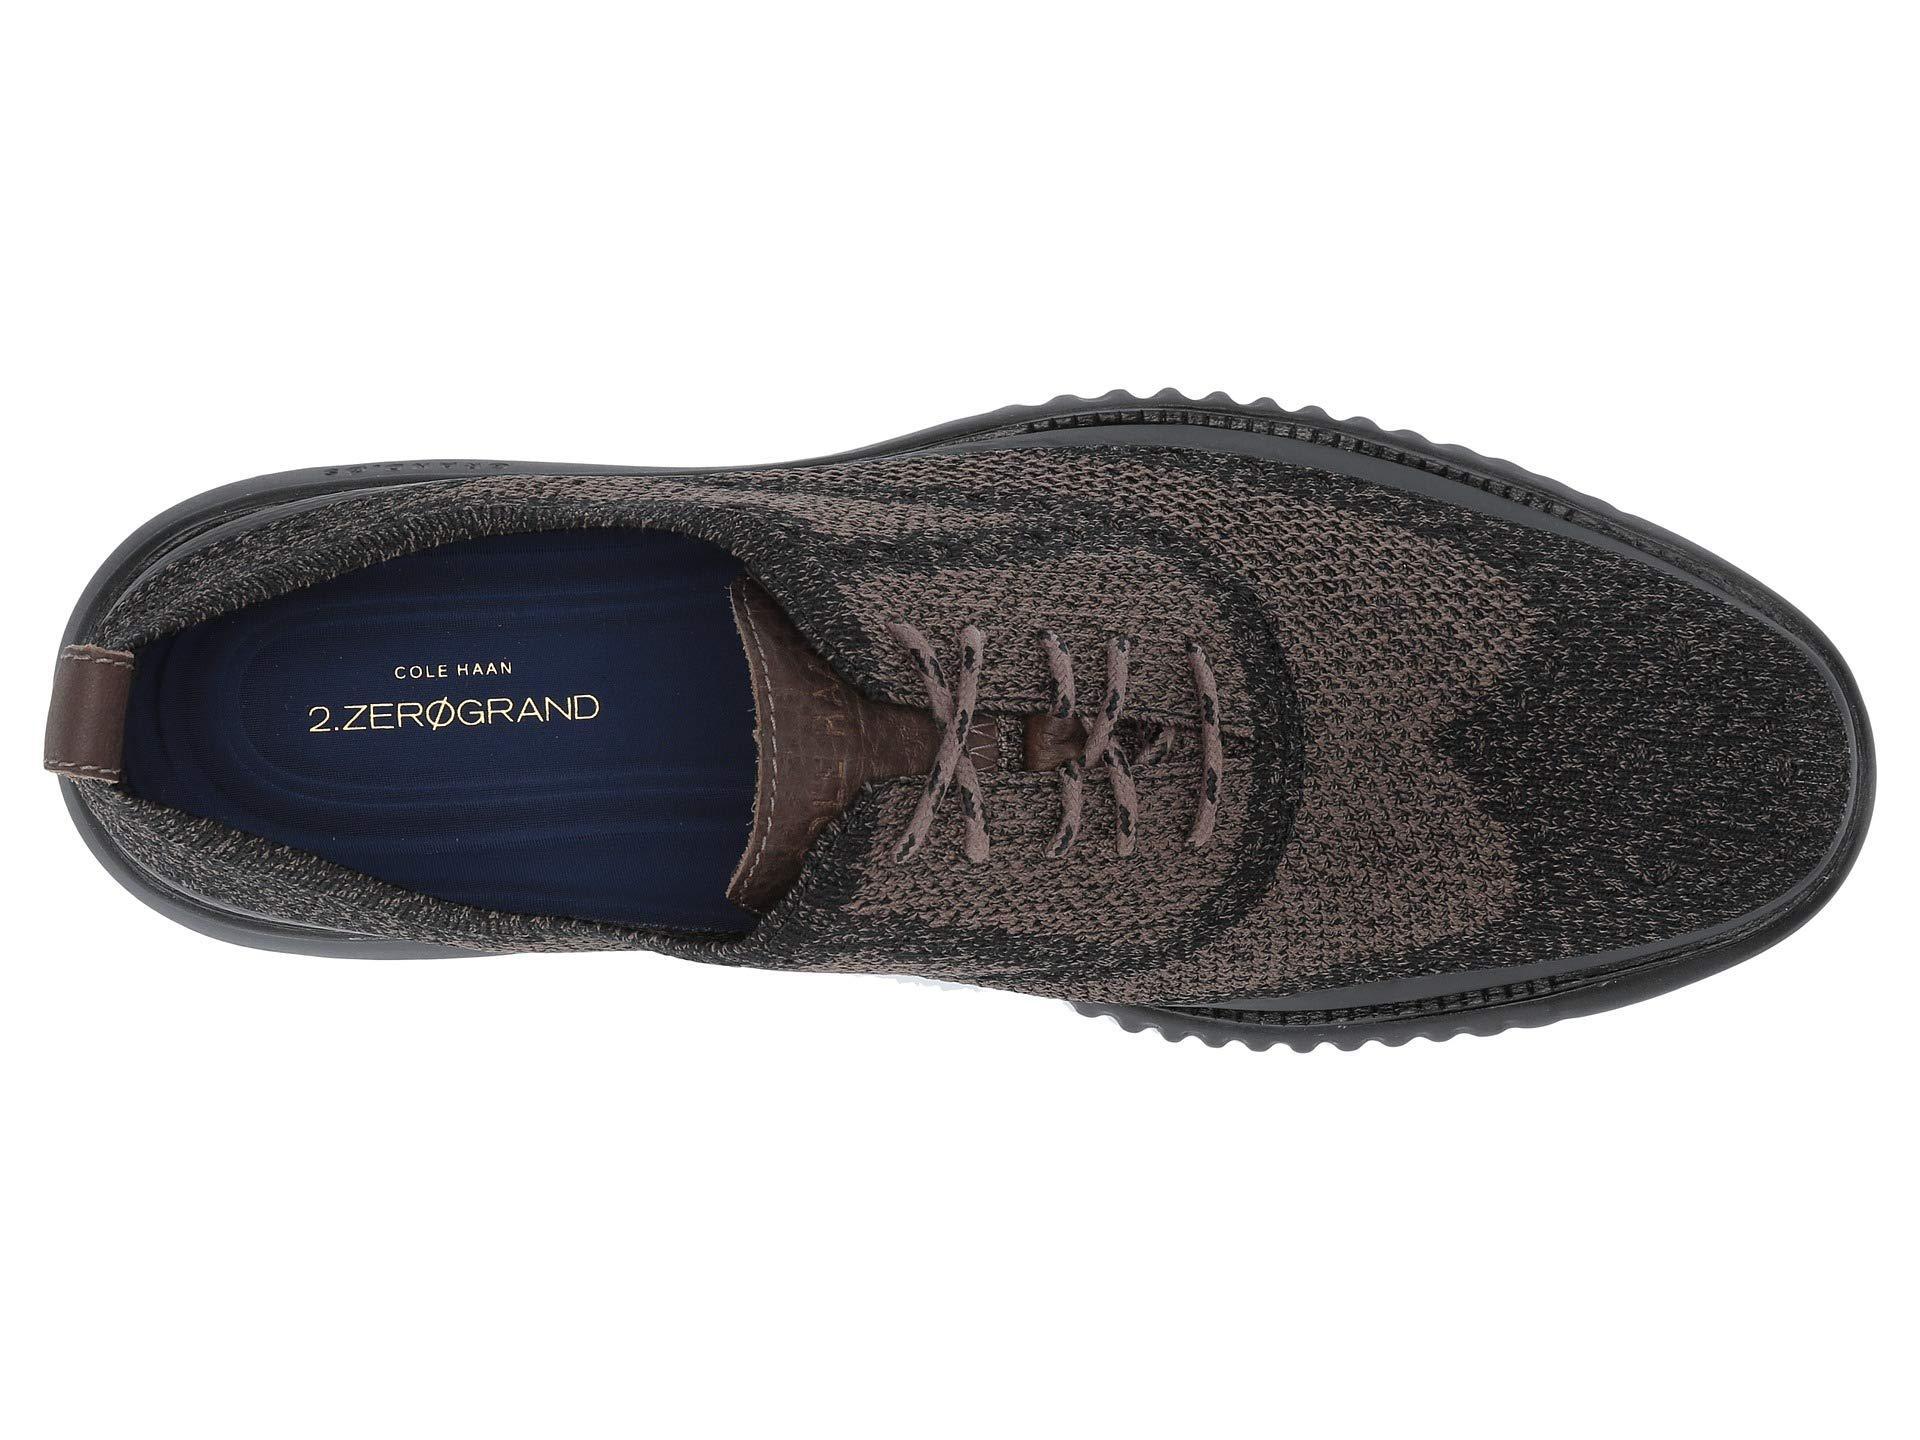 Cole Haan Mens 2.Zerogrand Stitchlite Ox Water Resistant Sneaker